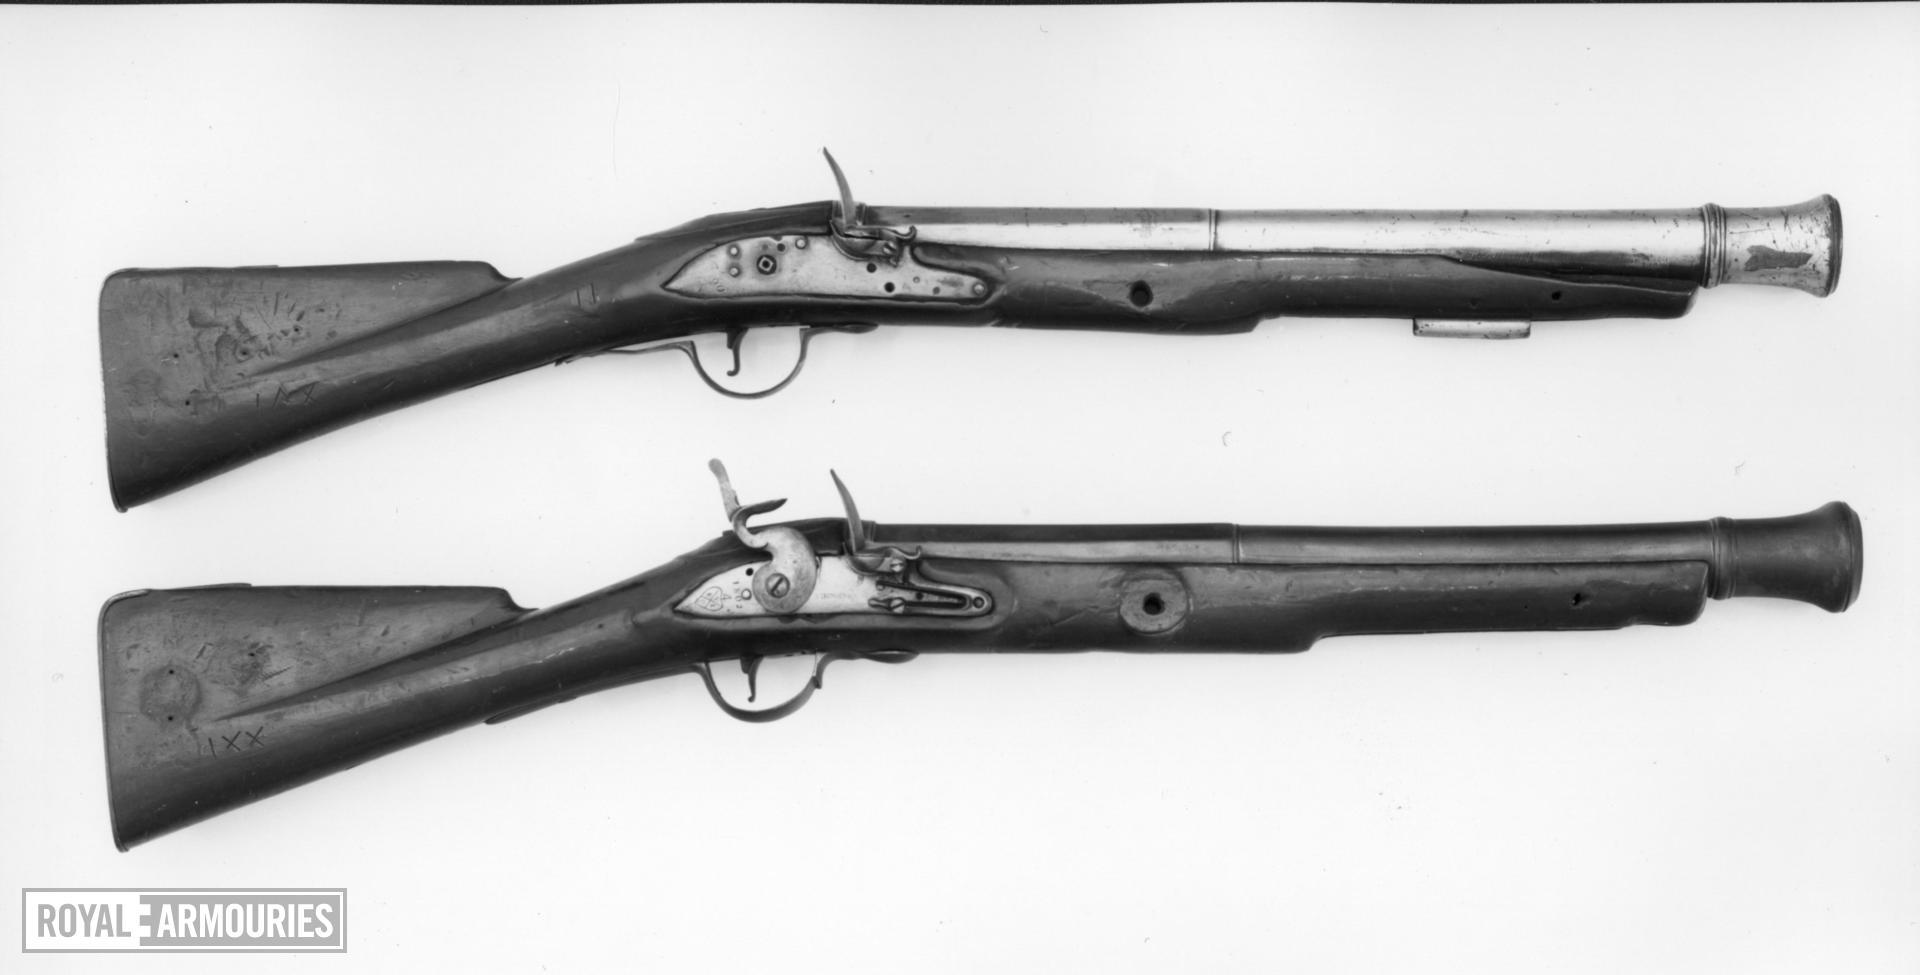 Flintlock muzzle-loading military musketoon - Sea Service Pattern